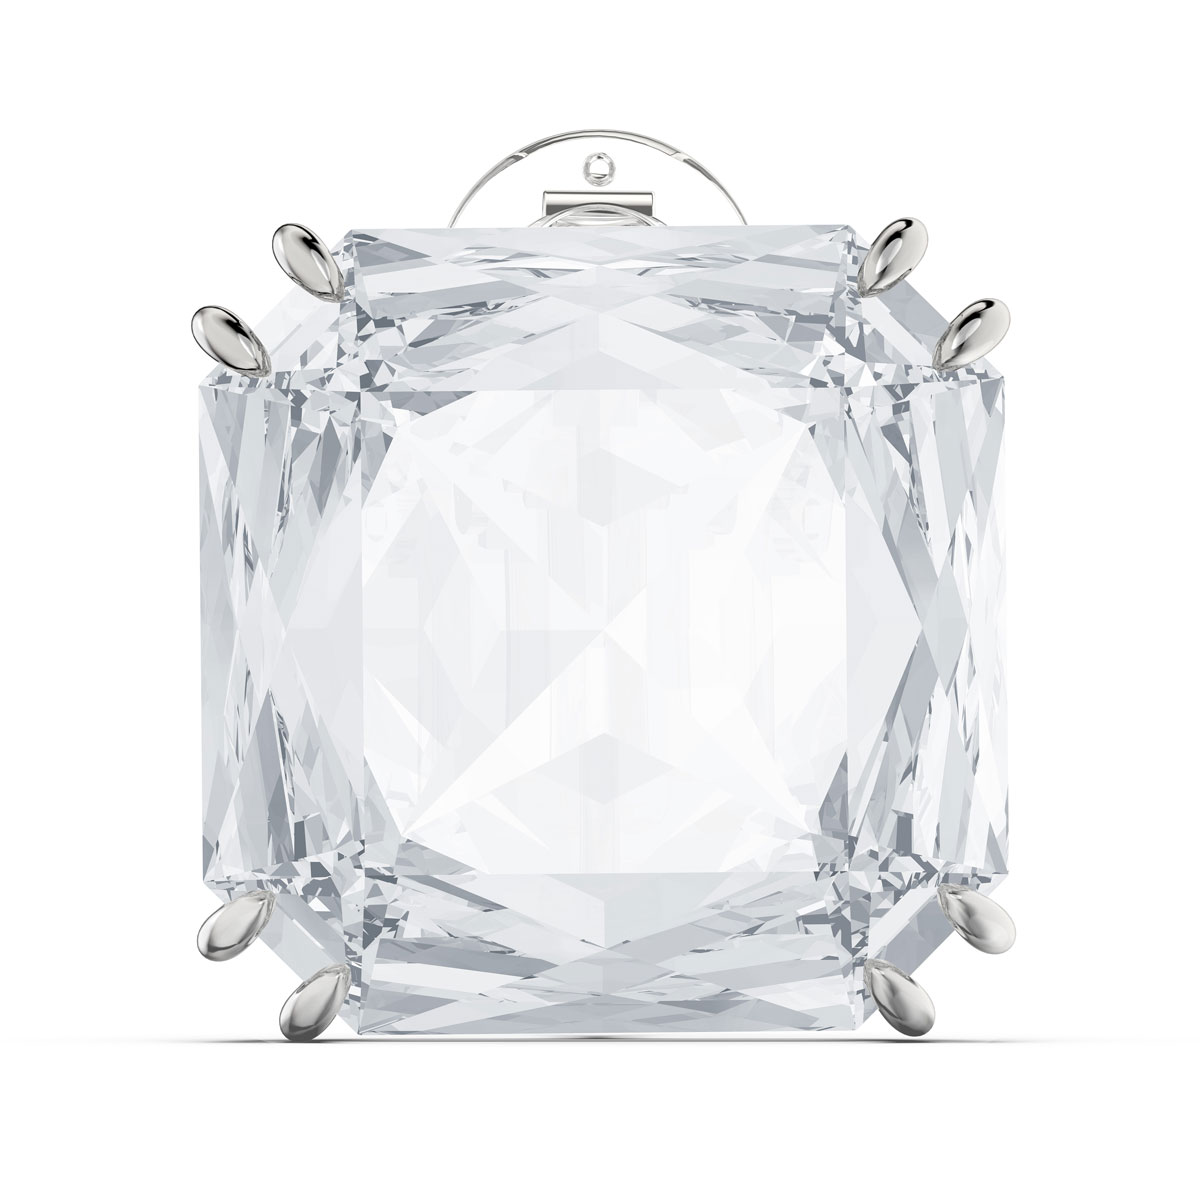 Swarovski Mesmera Earring Single, Square Cut Crystal, White, Rhodium Plated